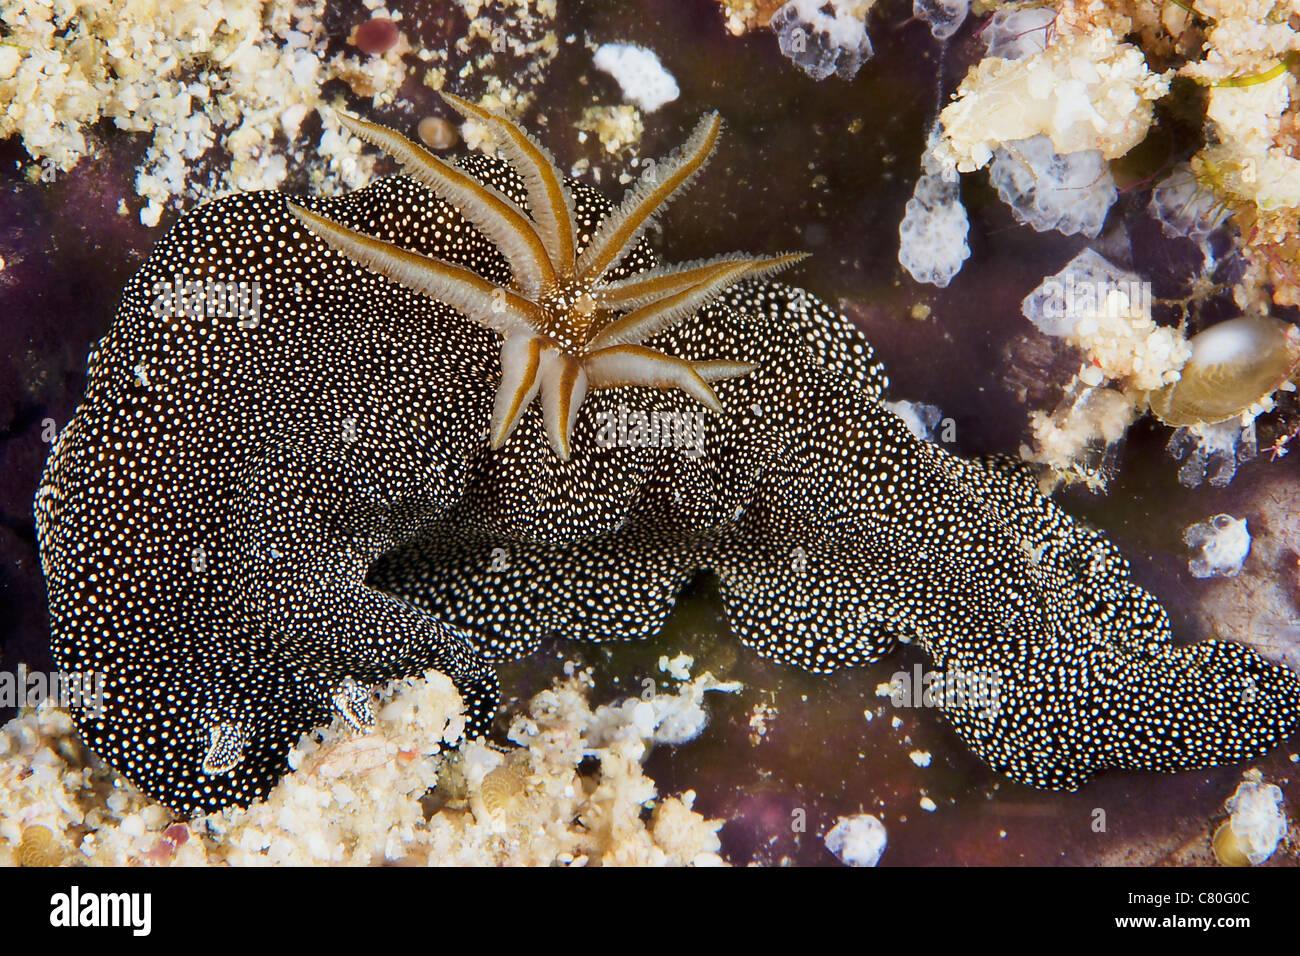 Nudibranch feeding on algae, Papua New Guinea. - Stock Image